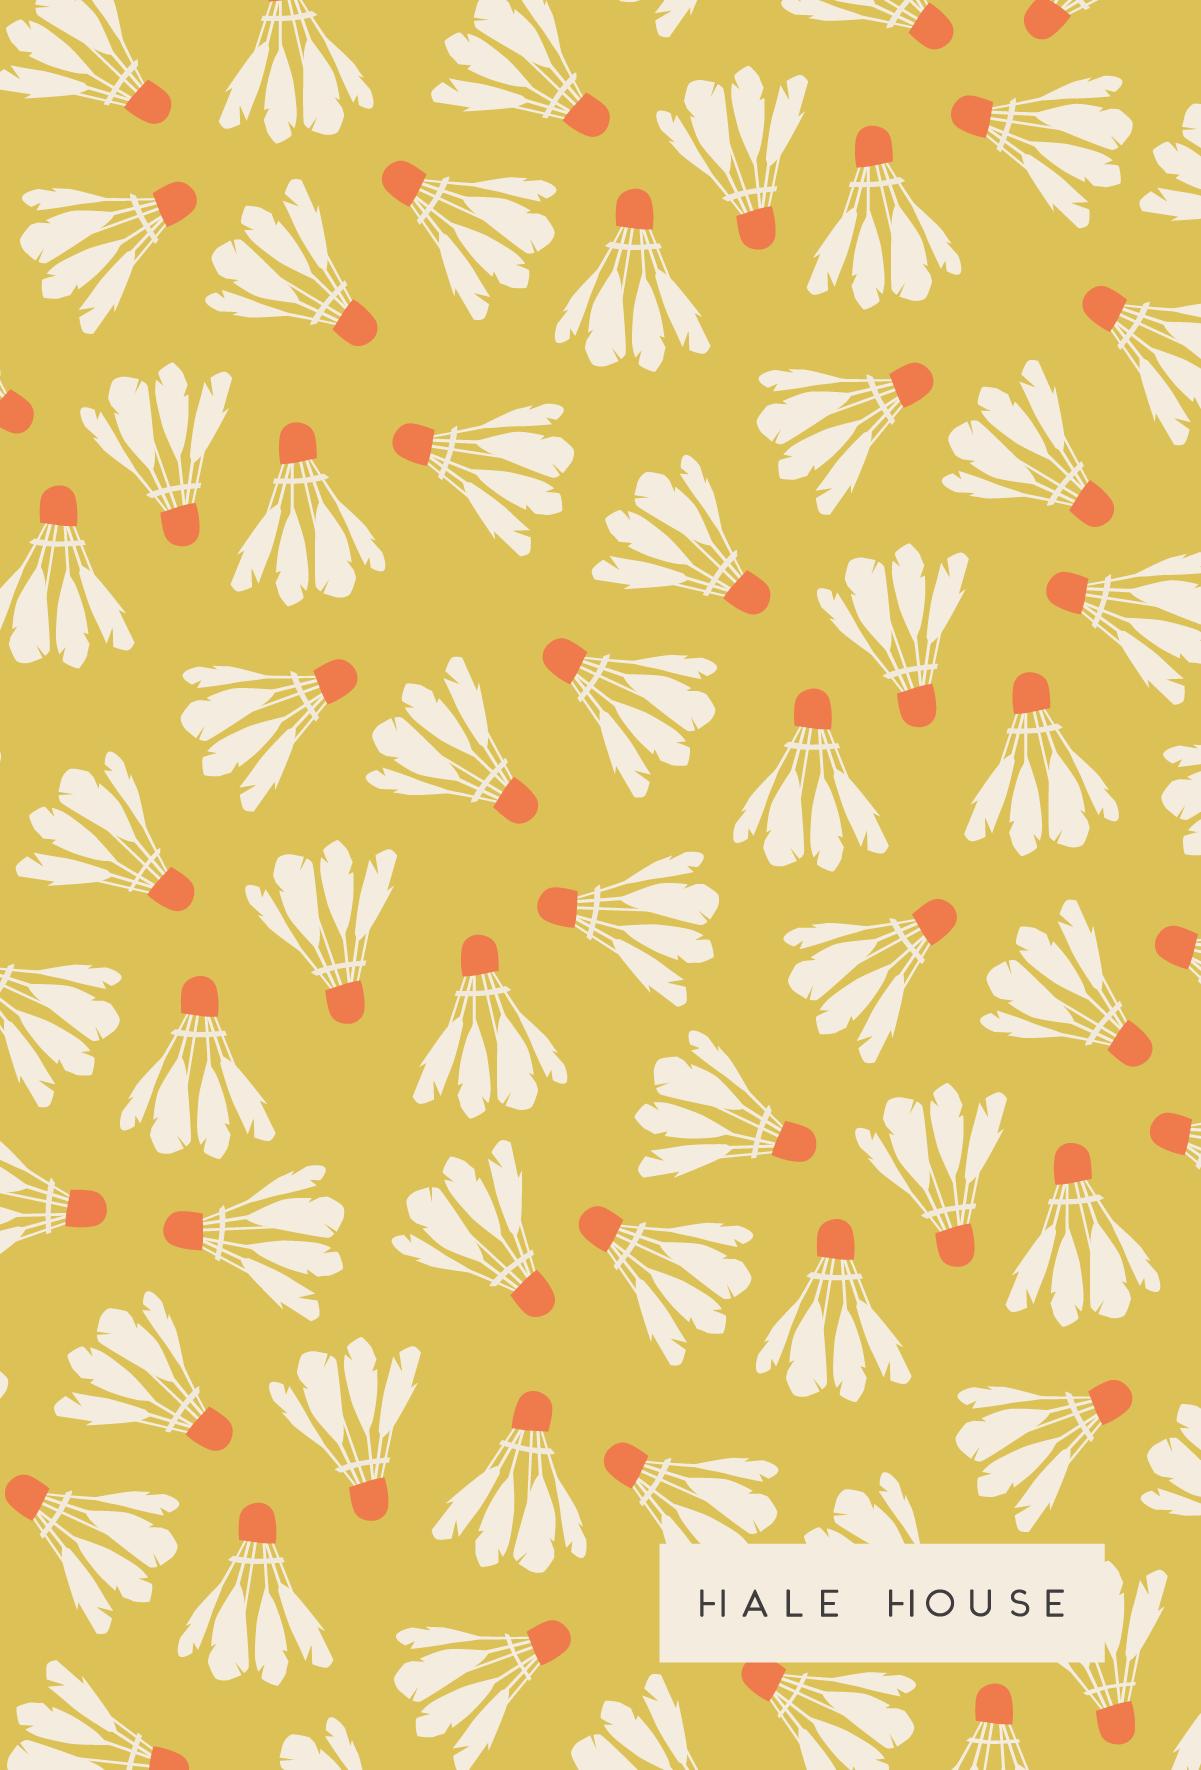 #patterndesign #pattern #shuttlecock #illustration #surfacepatterndesign